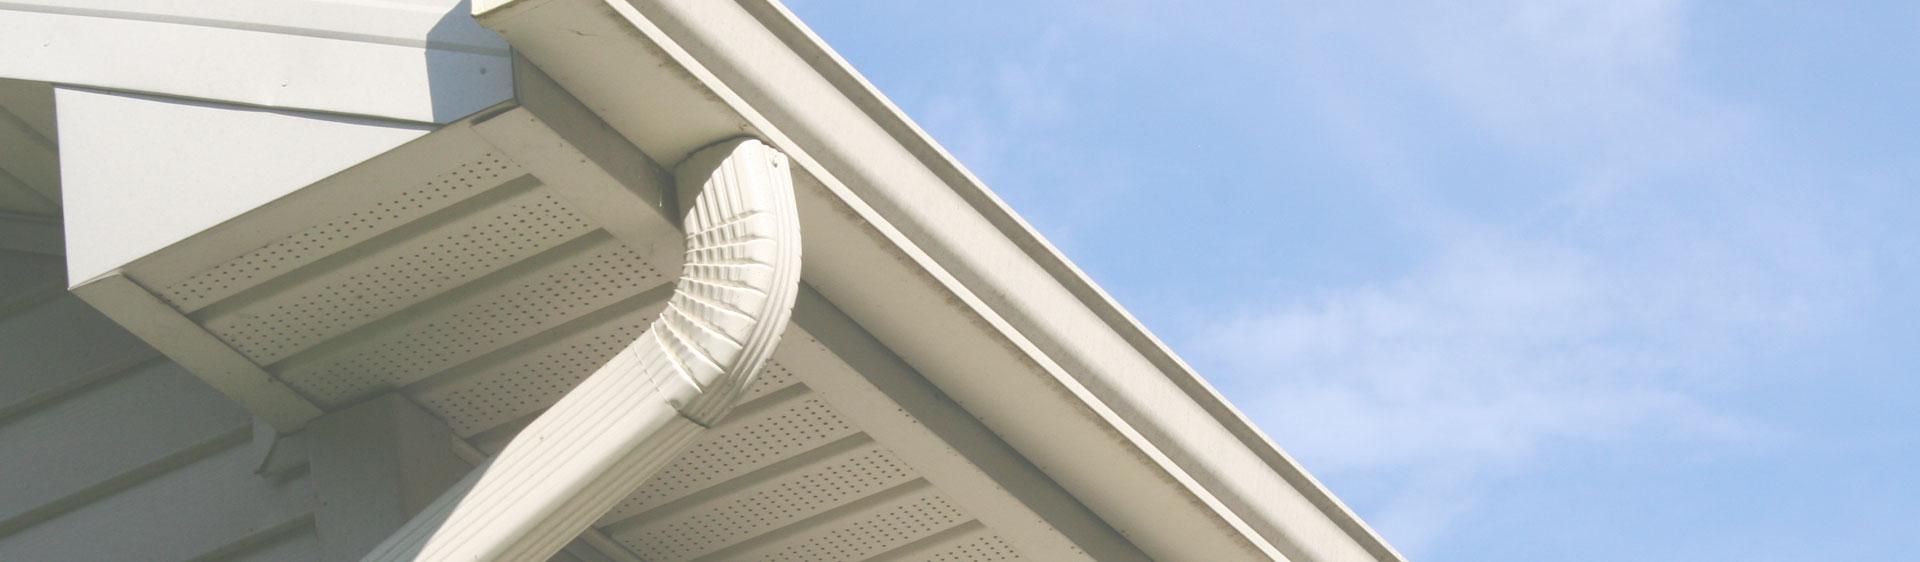 Etobicoke  Siding Services, Window Installation  and Gutter Installation